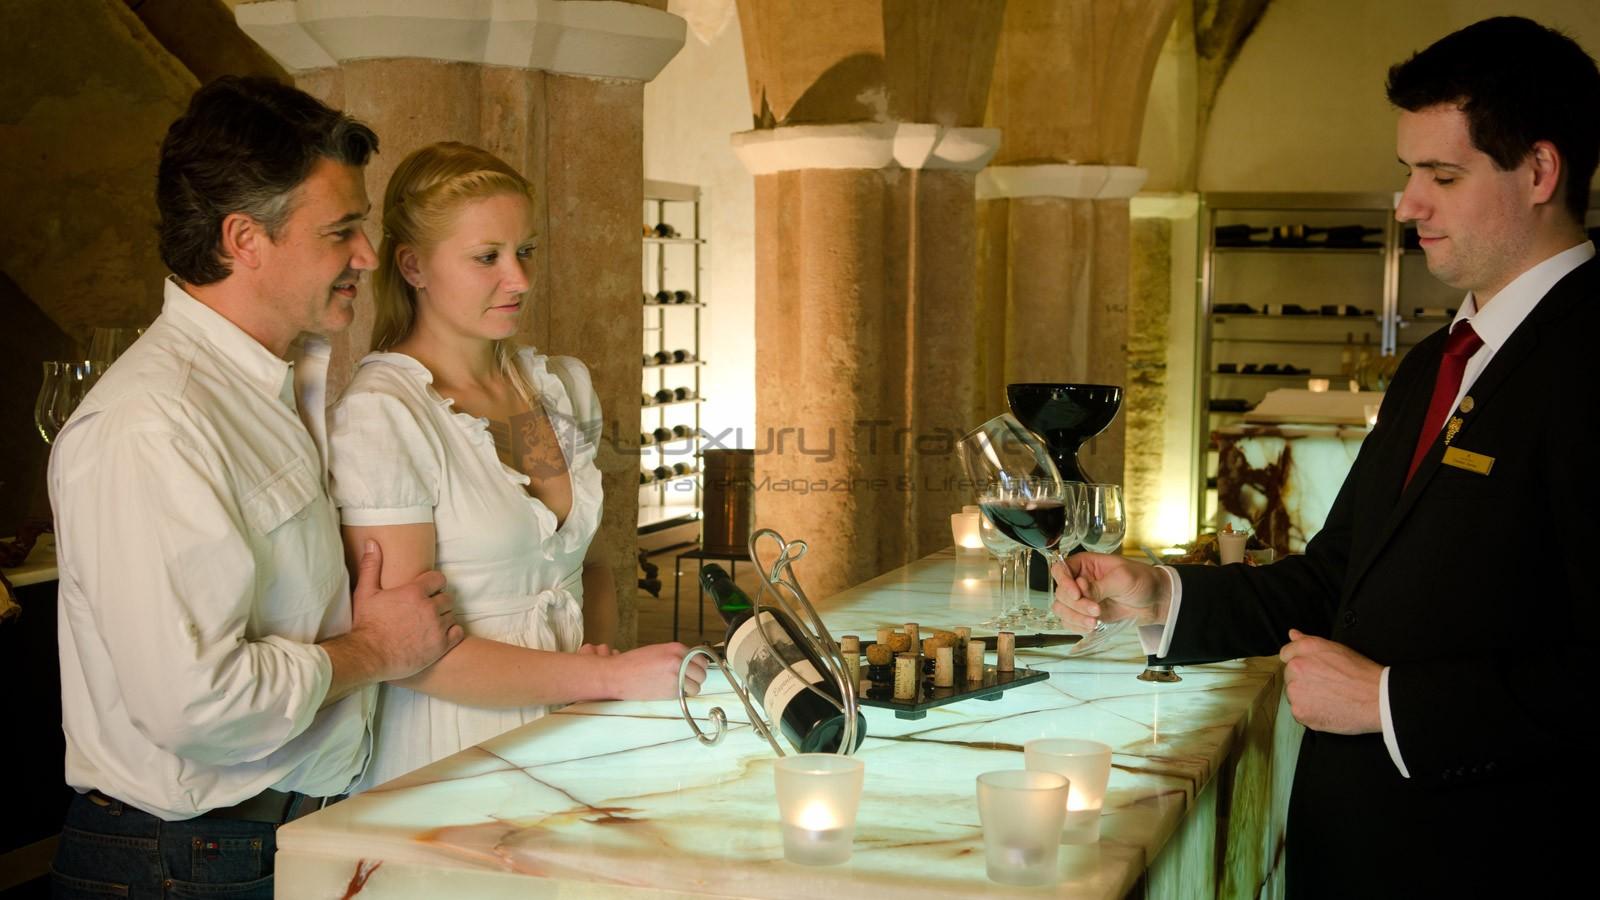 Convento_Espinheiro_Hotel_Evora_Starwood_Wine_Tasting